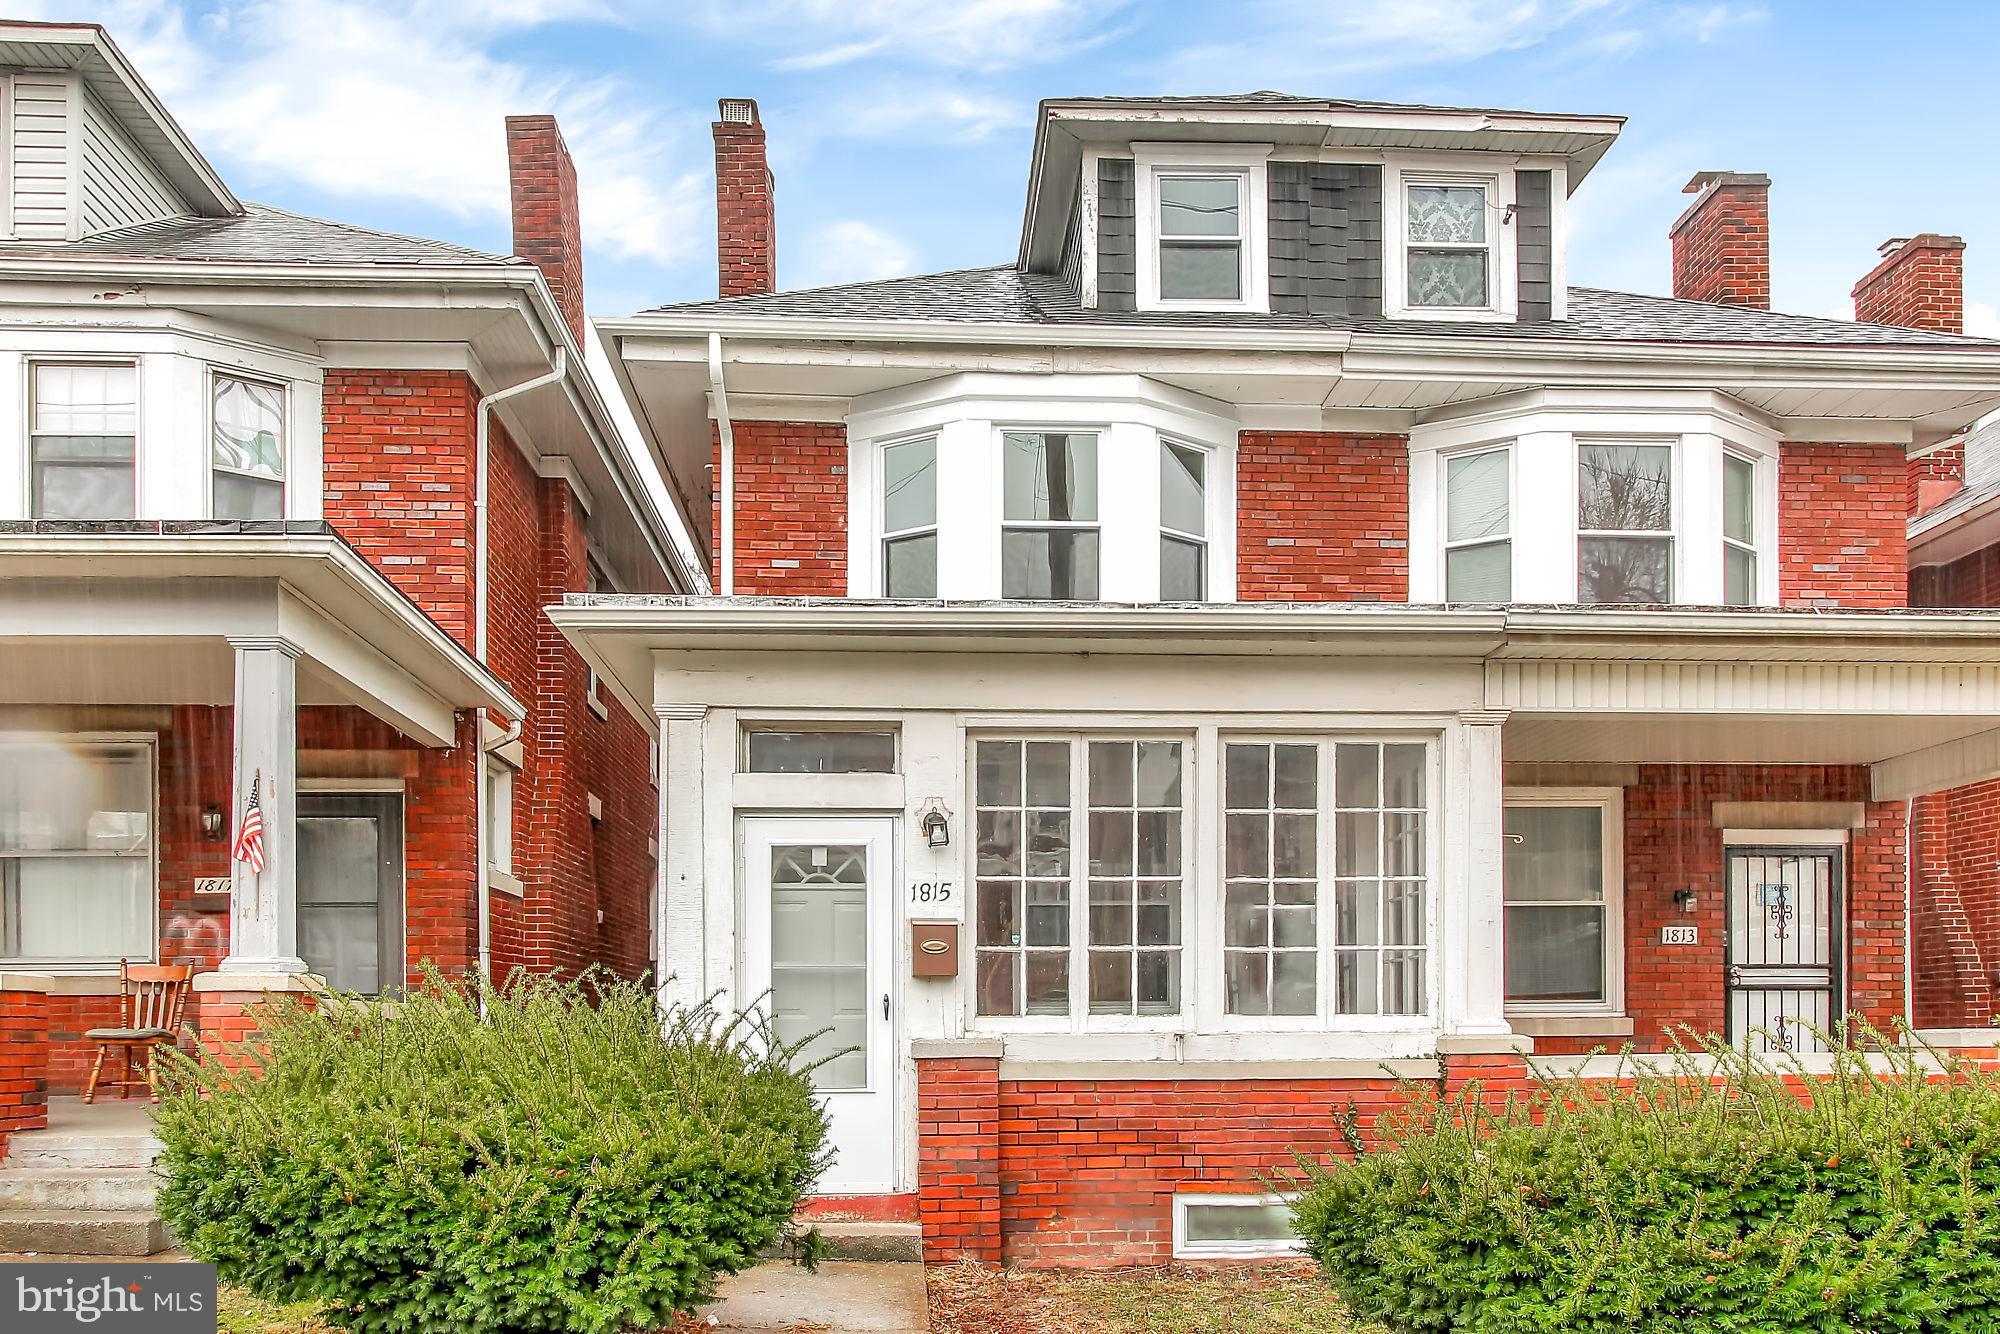 1815 HOLLY STREET, HARRISBURG, PA 17104